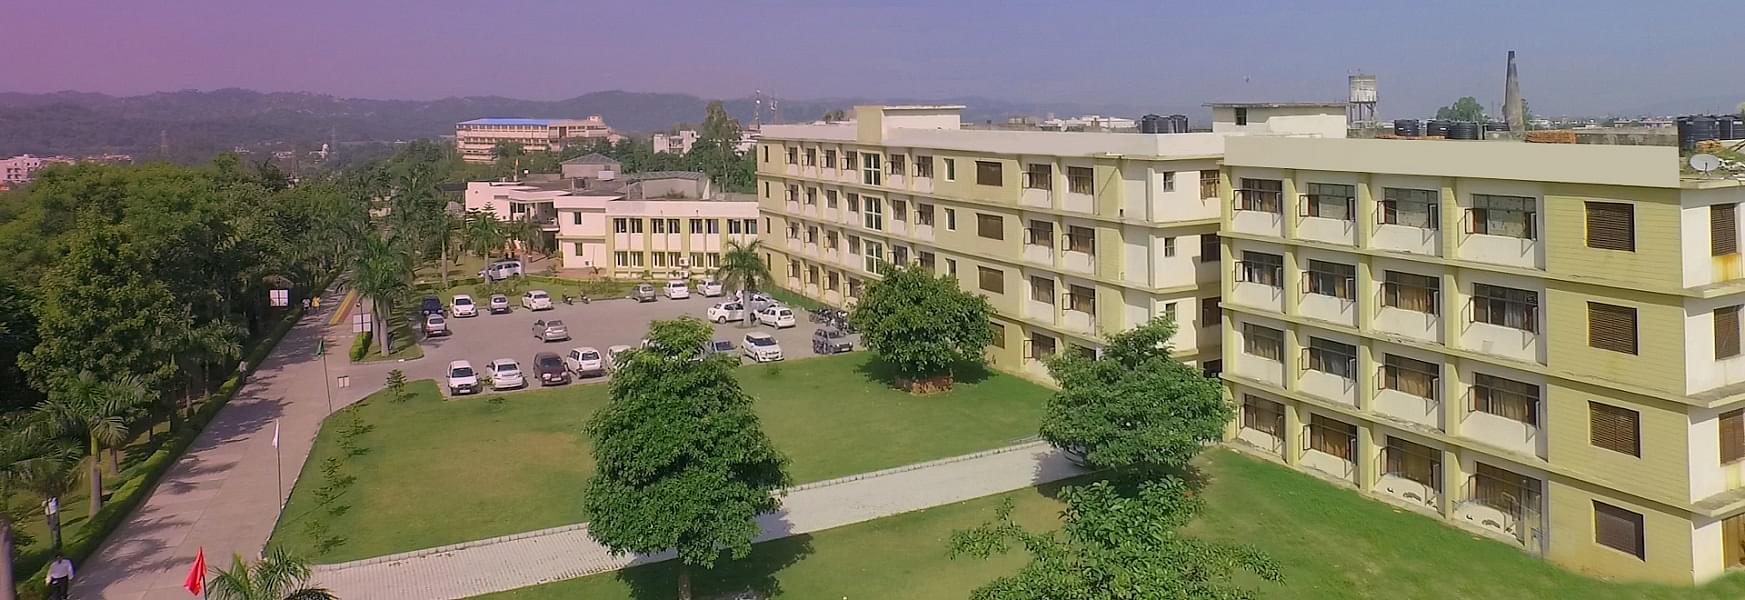 Baddi University of Emerging Sciences and Technologies - [BUEST]